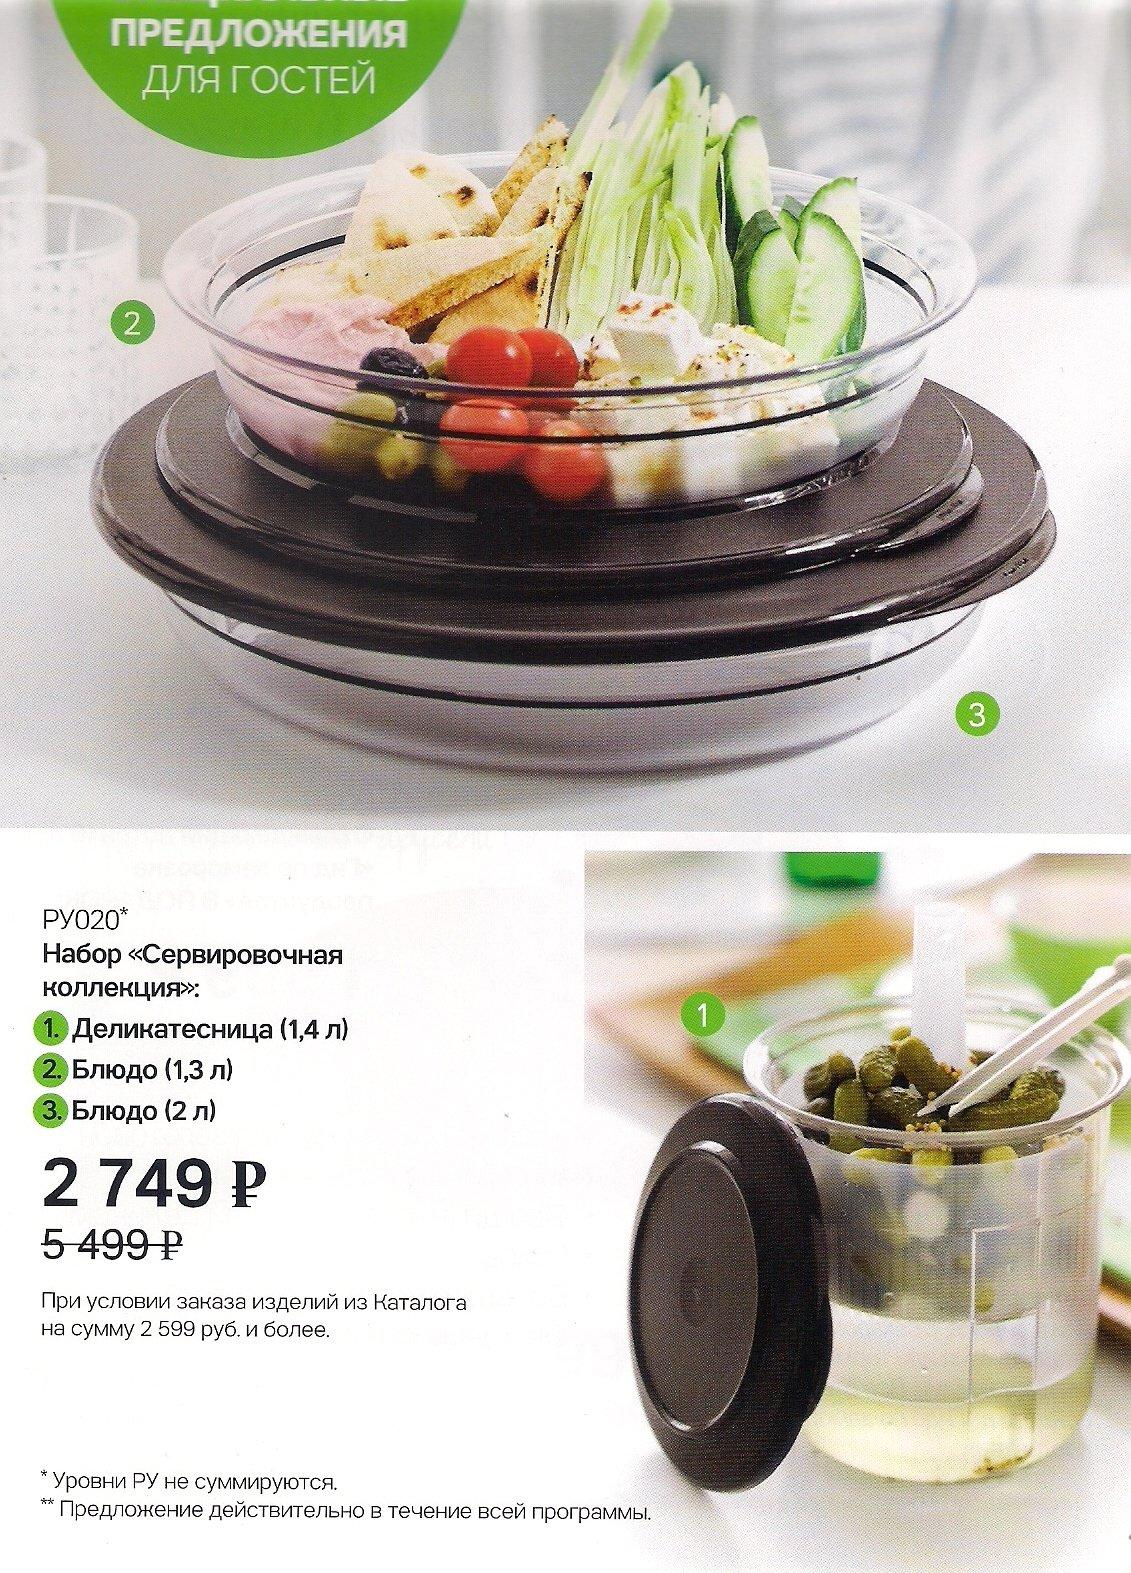 http://tupperware-online.ru/images/upload/14a.jpg